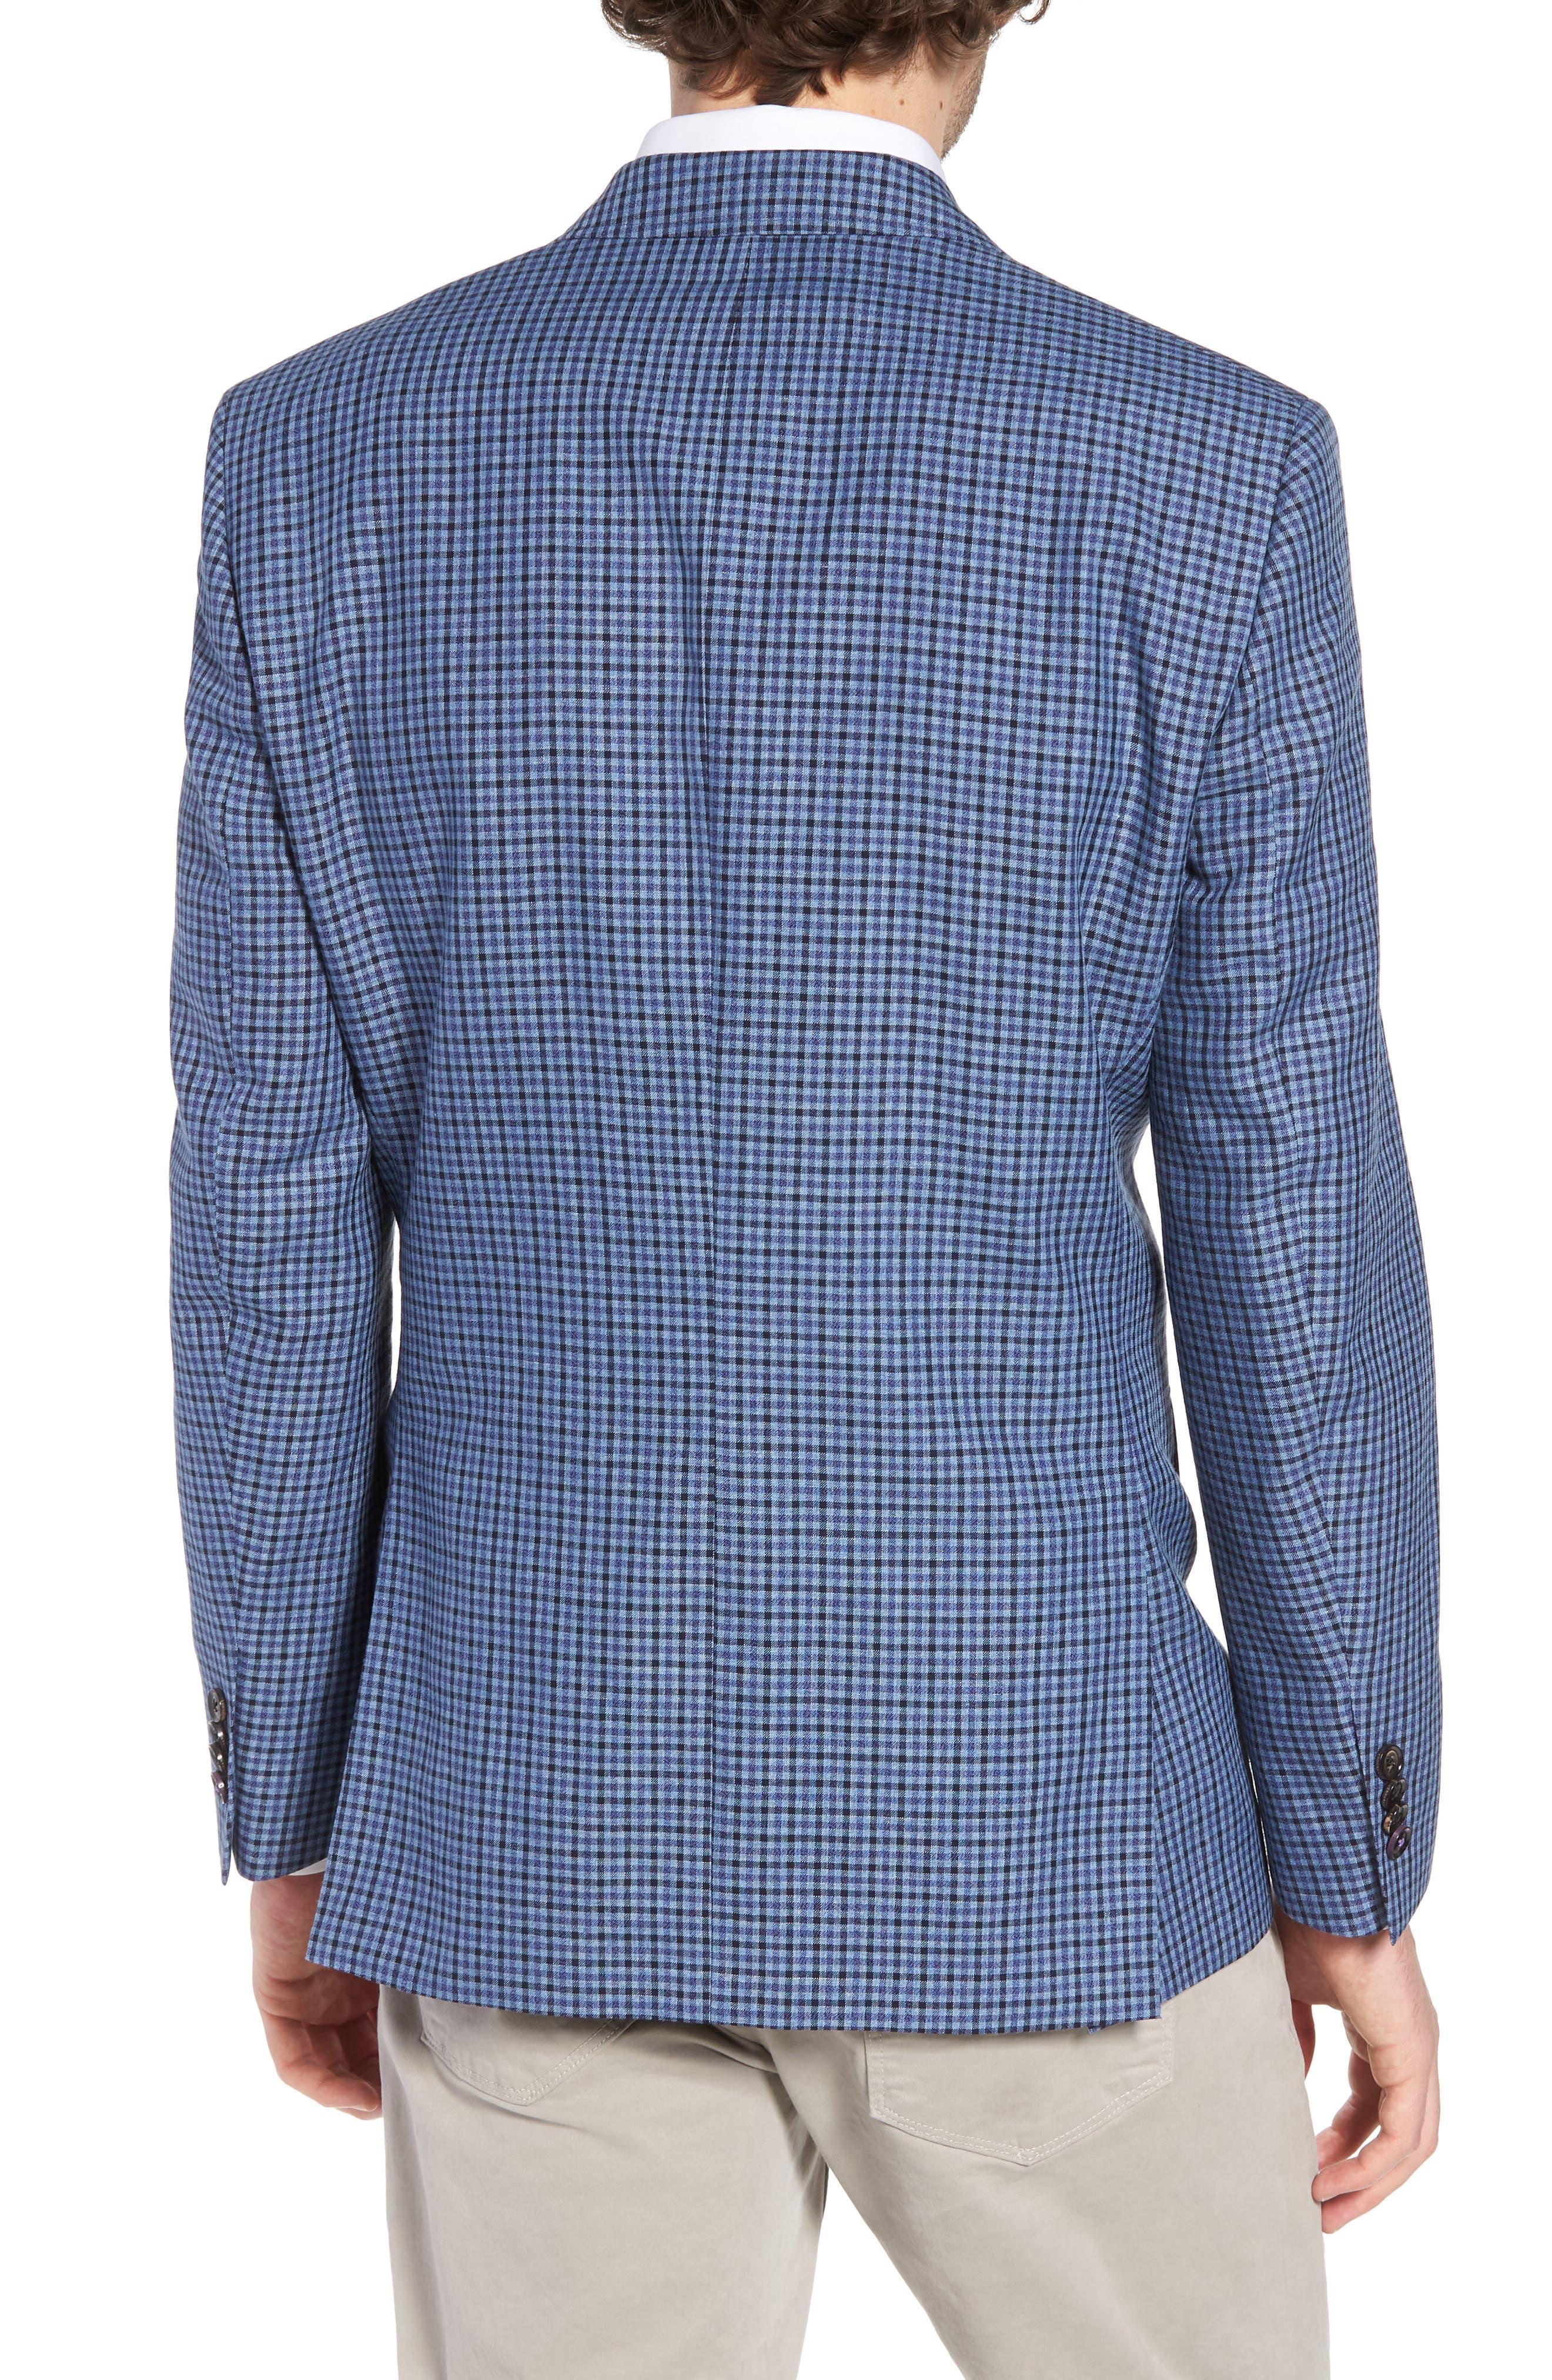 Jay Trim Fit Check Wool & Linen Sport Coat,                             Alternate thumbnail 2, color,                             Blue